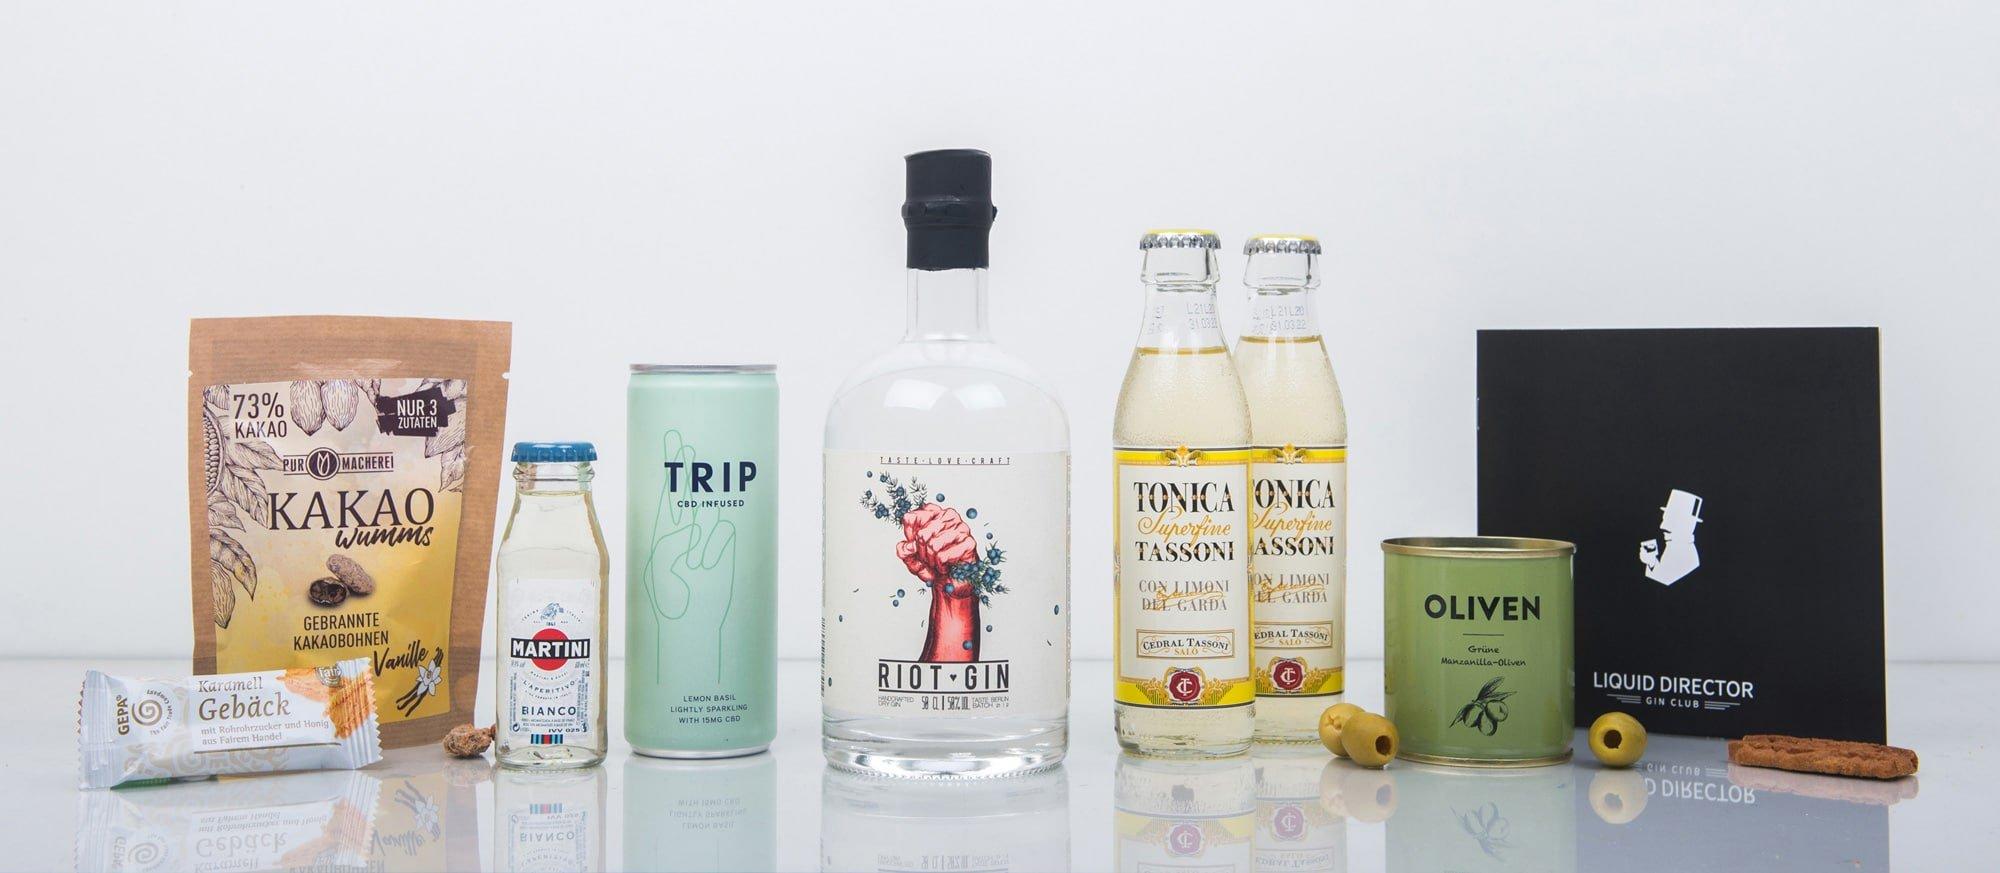 Der Riot Gin bei Liquid Director Gin Club